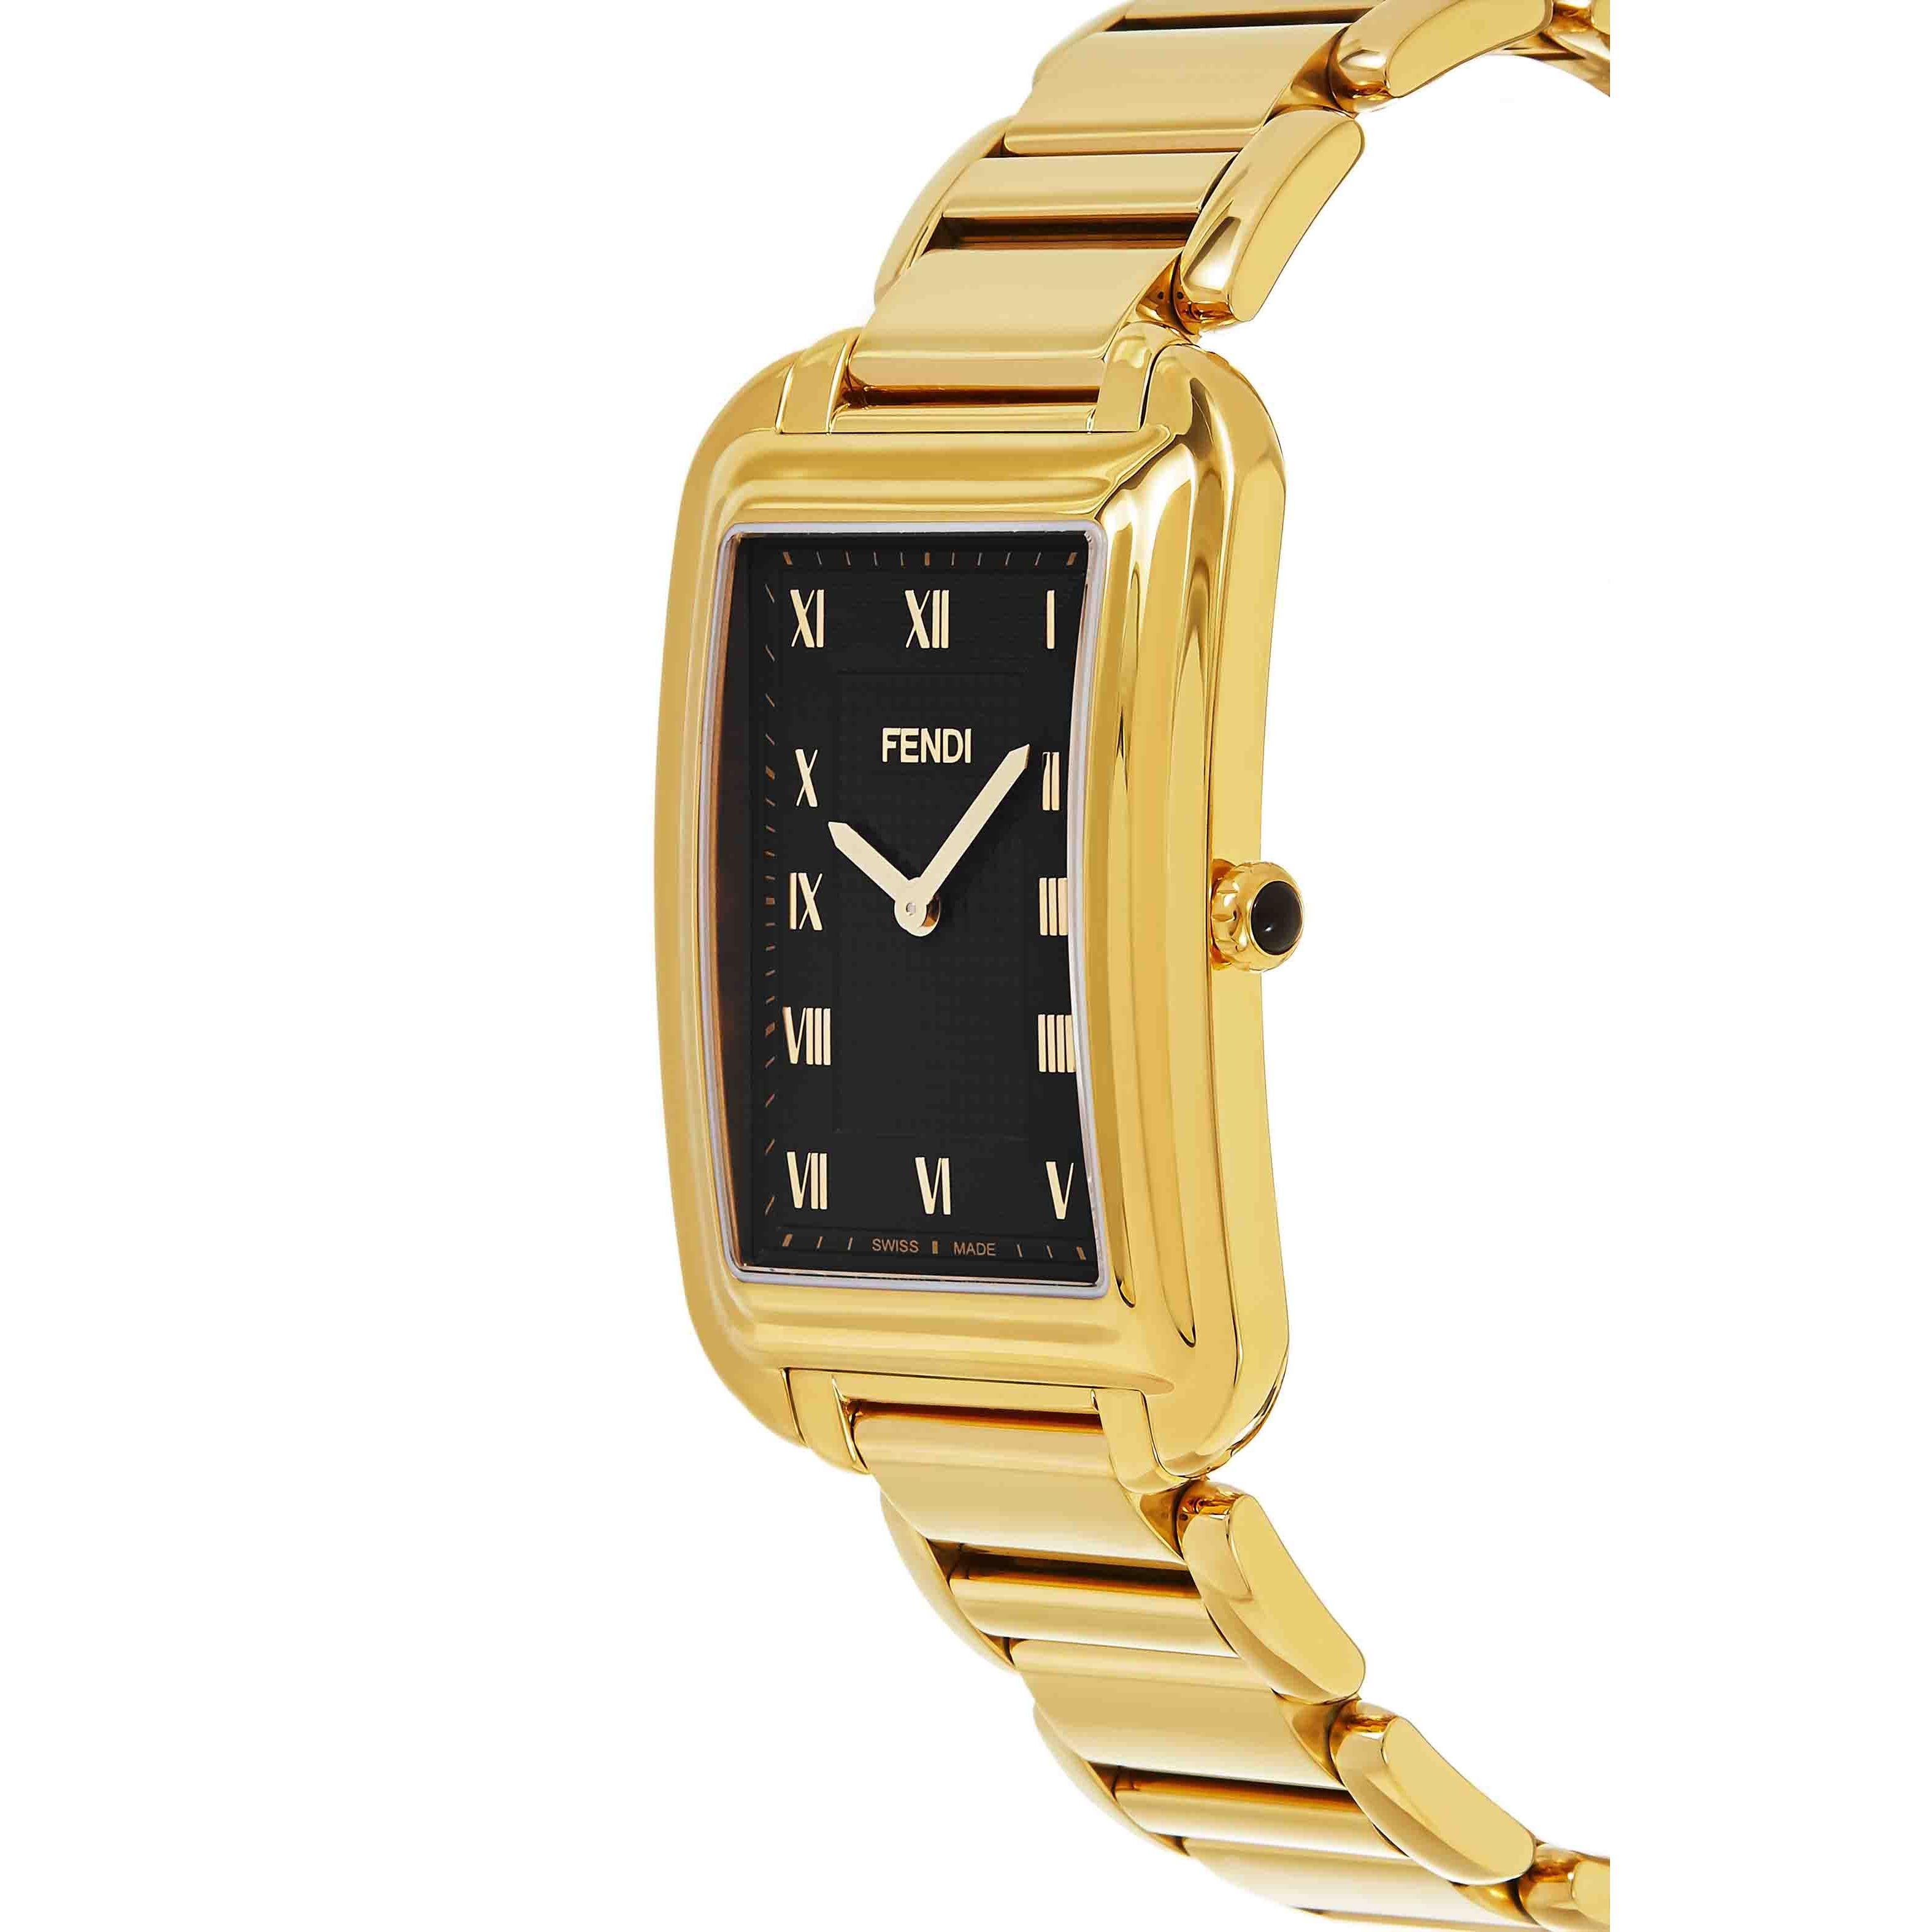 caab3c3f112e Fendi Men s  Classico Rectangle  Black Dial Yellow Goldtone Stainless Steel  Swiss Quartz Watch